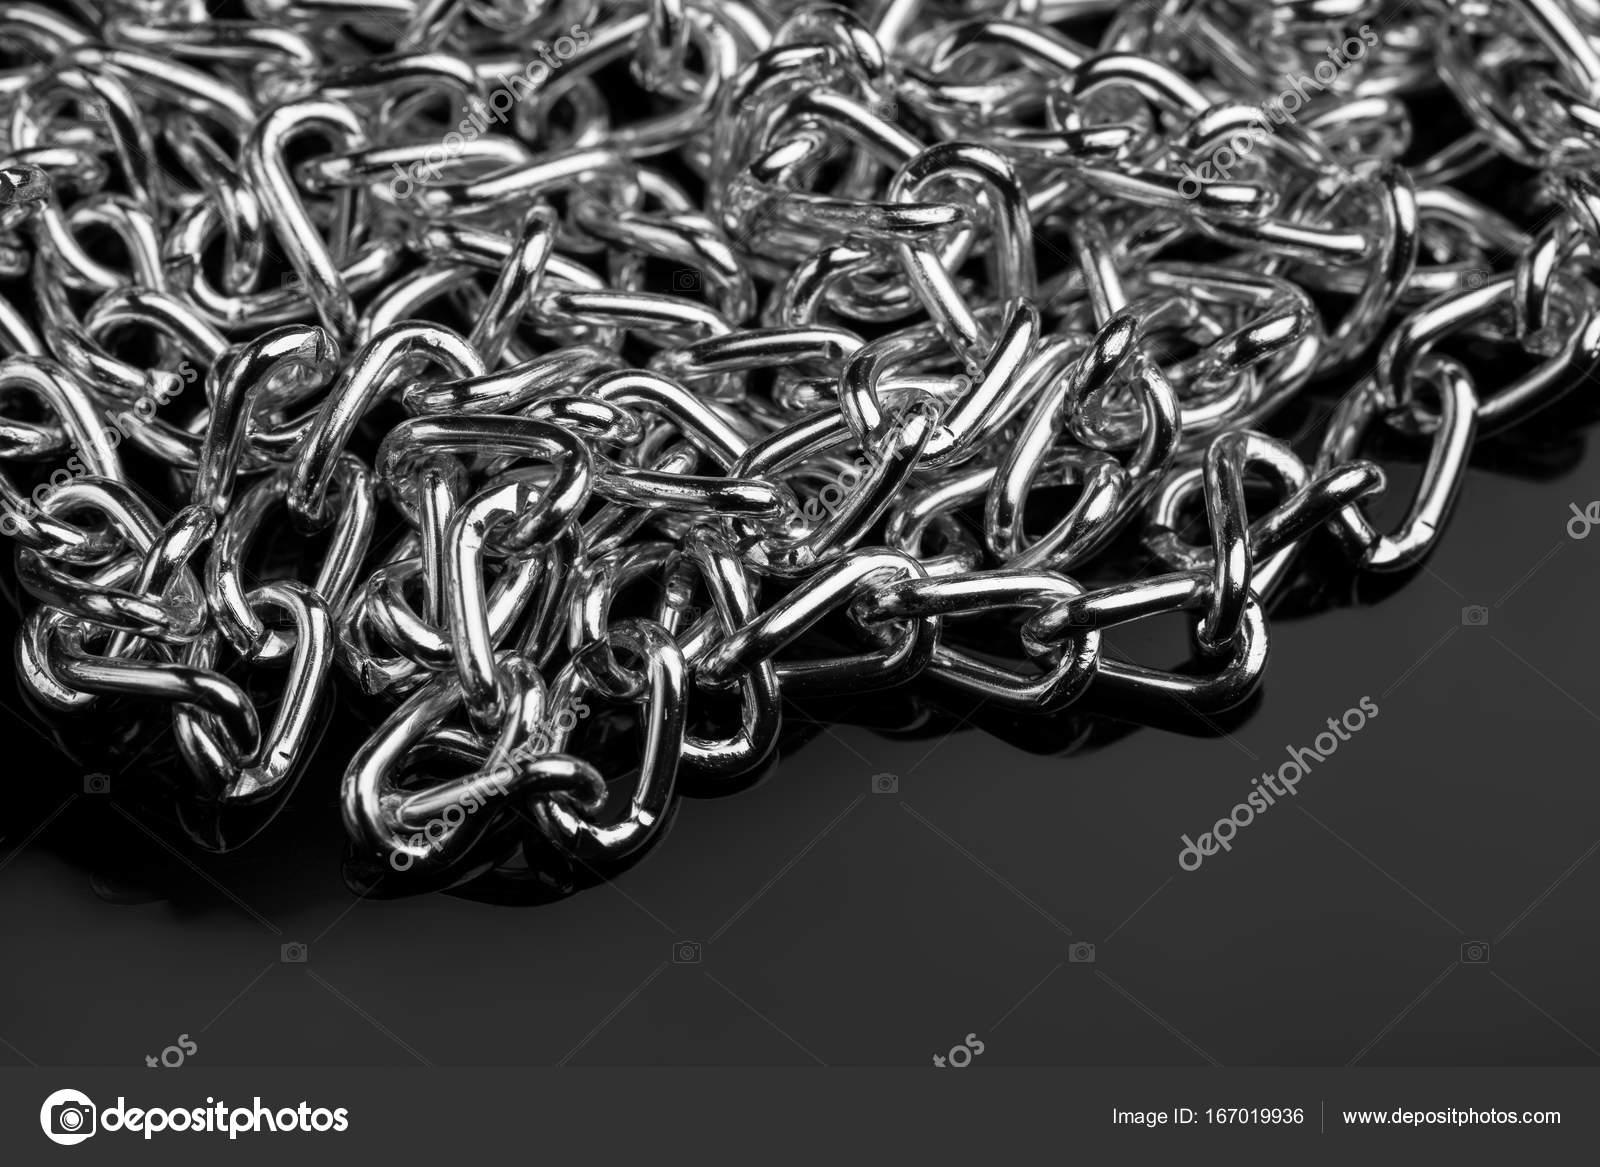 6670cc60e6 Σετ μεταλλική αλυσίδα διαφορετικού μήκους. Αξεσουάρ. Χρυσοχοεία. Ασήμι —  Εικόνα από malyarevsky.stock.gmail.com. Βρείτε παρόμοιες εικόνες